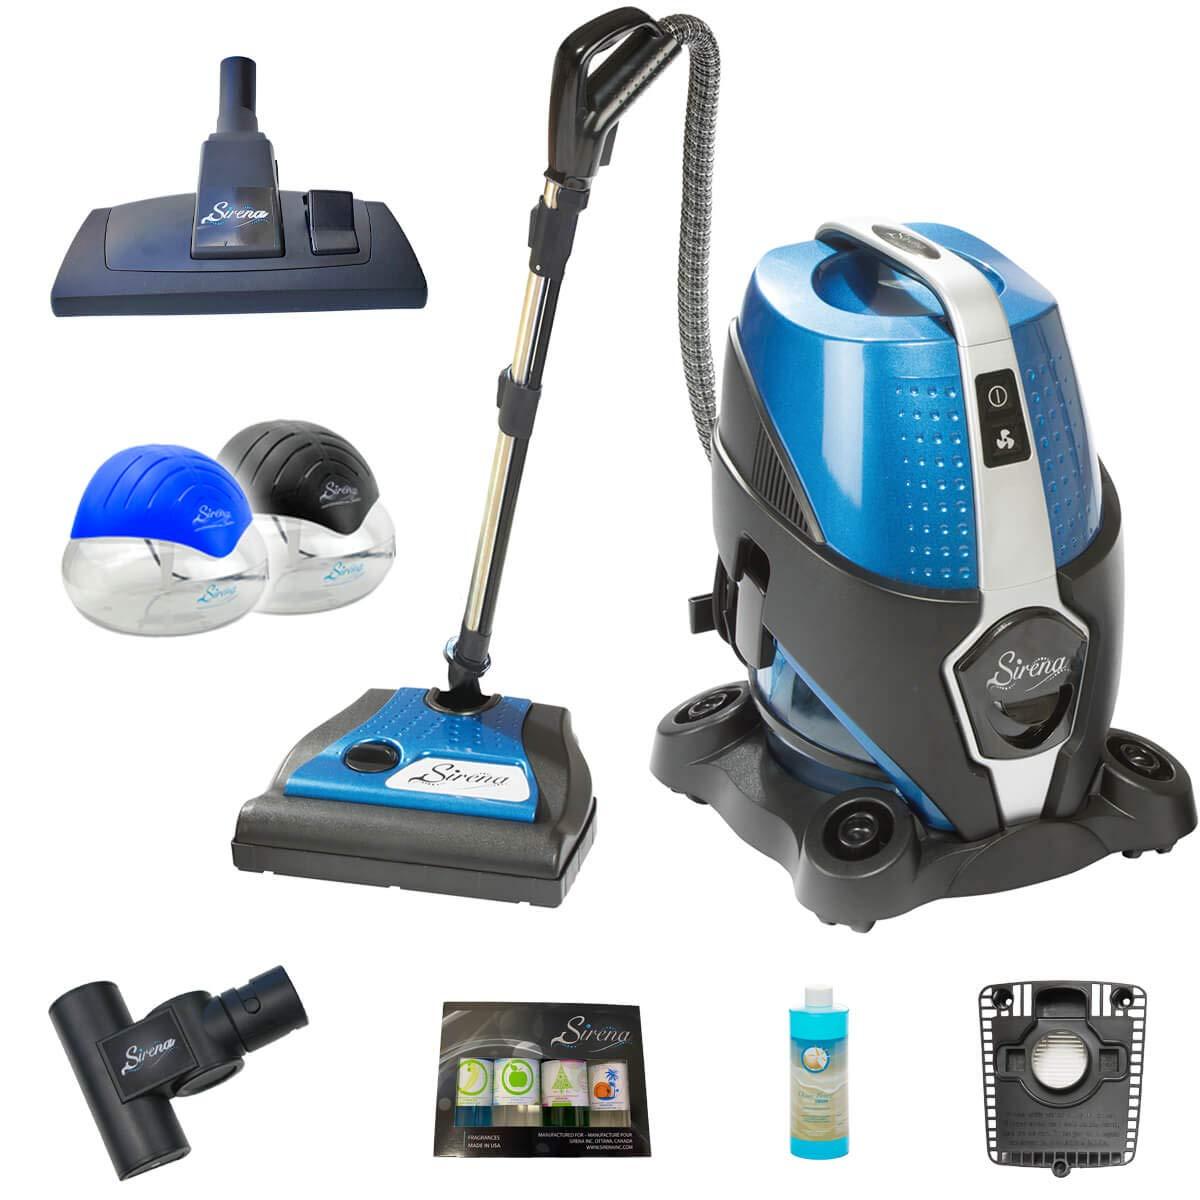 Sirena Bagless Vacuum Cleaner Premium Pack - Lightweight Water Filtration Pet Vacuum - Bonus 2 Twister Air Purifiers, HEPA Filter and Turbo Brush - Hardwood Floor Sweeper and Pet Hair Cleaner